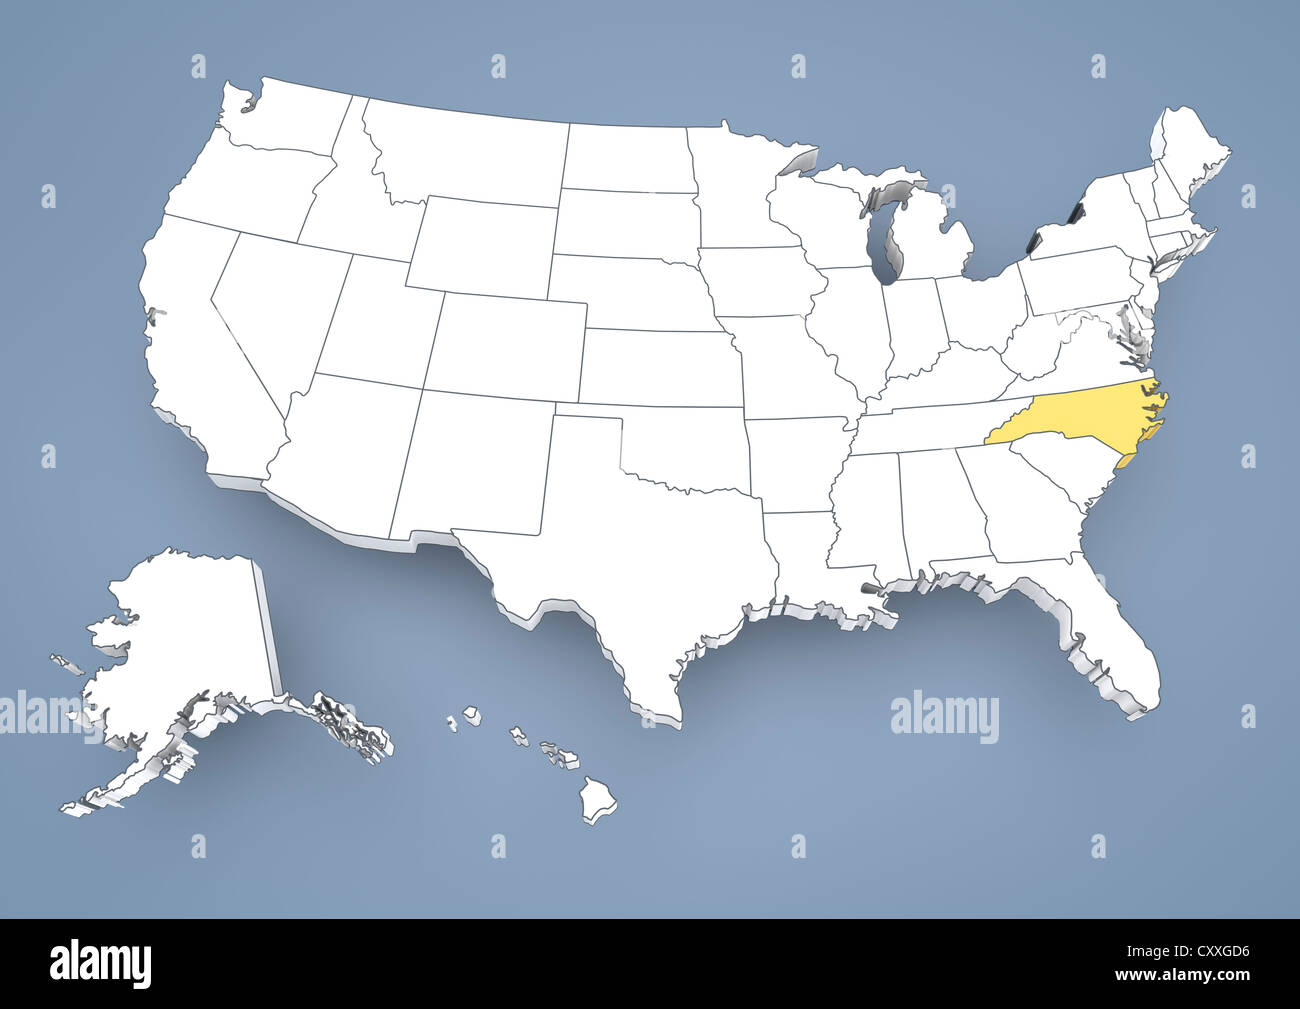 North Carolina, NC, highlighted on a contour map of USA ... on north carolina back then, beech mountain nc map, denver north carolina map, bern north carolina map, north carolina's map, north carolina mountains, state of n carolina map, city of north carolina map, north carolina casinos locations, north carolina home map, north carolina on globe, hotel charlotte north carolina map, charleston south carolina on us map, north carolina in us, north carolina highway map, north carolina map with cities only, north dakota, small towns north carolina map, alabama river us map, north carolina on a map,